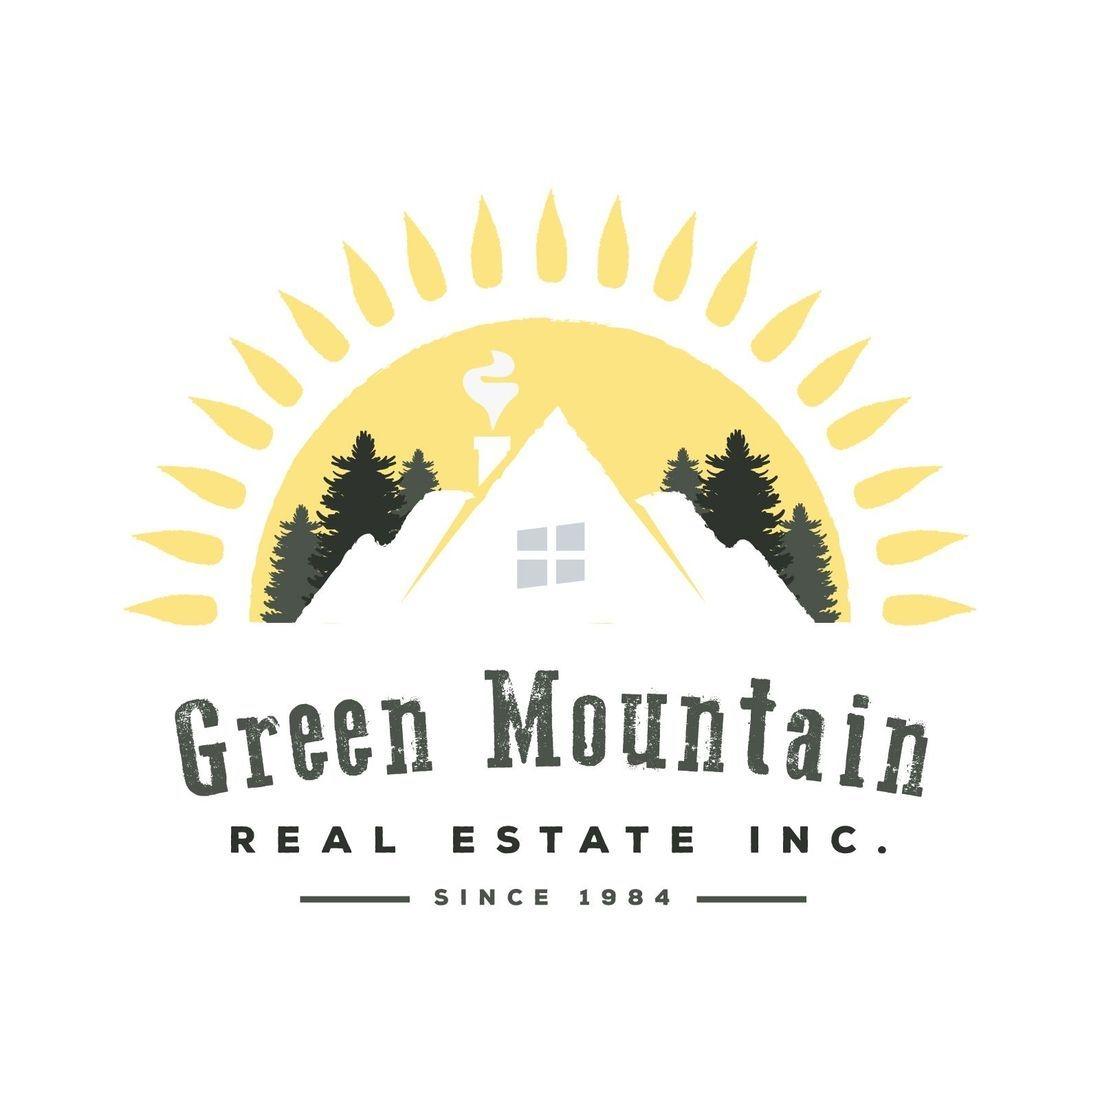 Green Mountain Real Estate Inc.